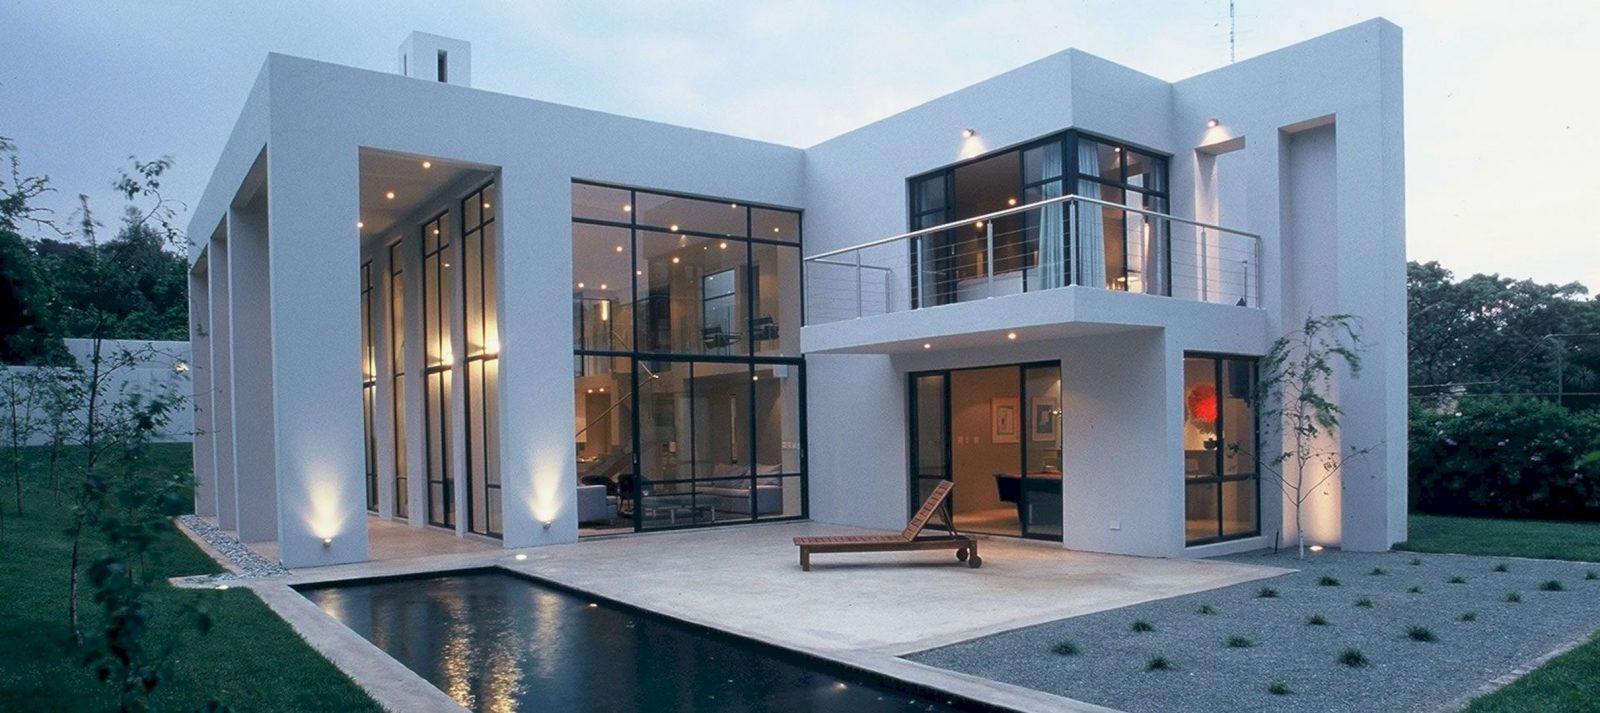 House Kotze By Hugo Hamity Architects 17